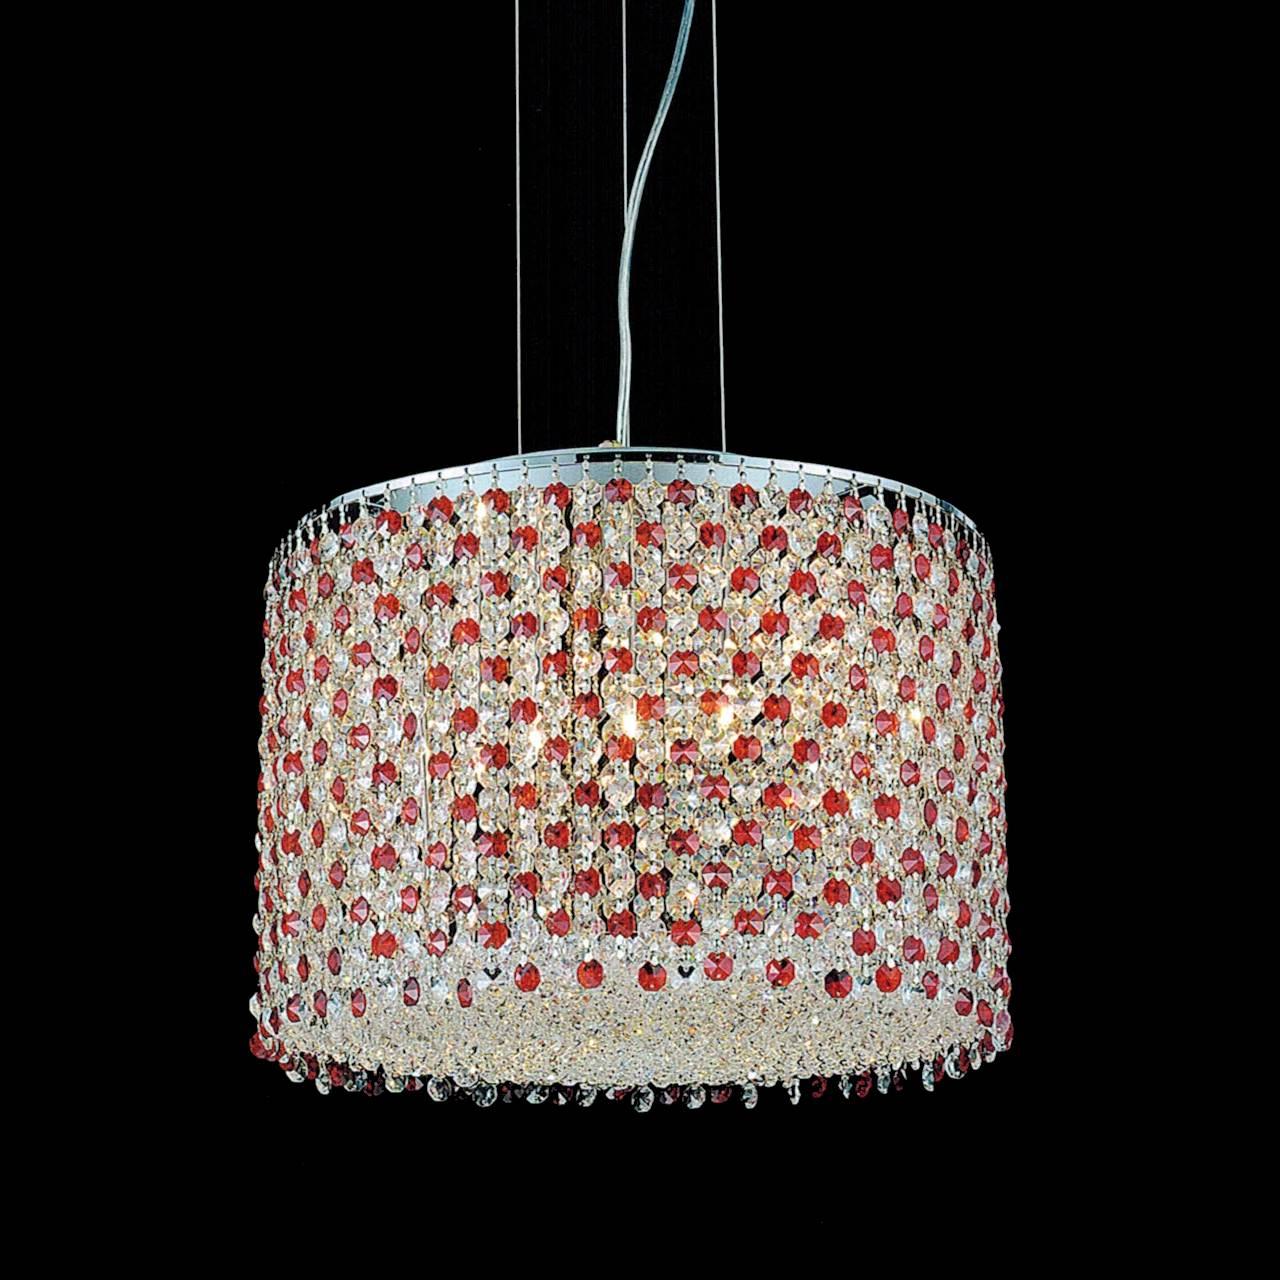 Brizzo lighting stores 16 rainbow modern round crystal chandelier picture of 16 rainbow modern round crystal chandelier polished chrome 12 lights aloadofball Choice Image